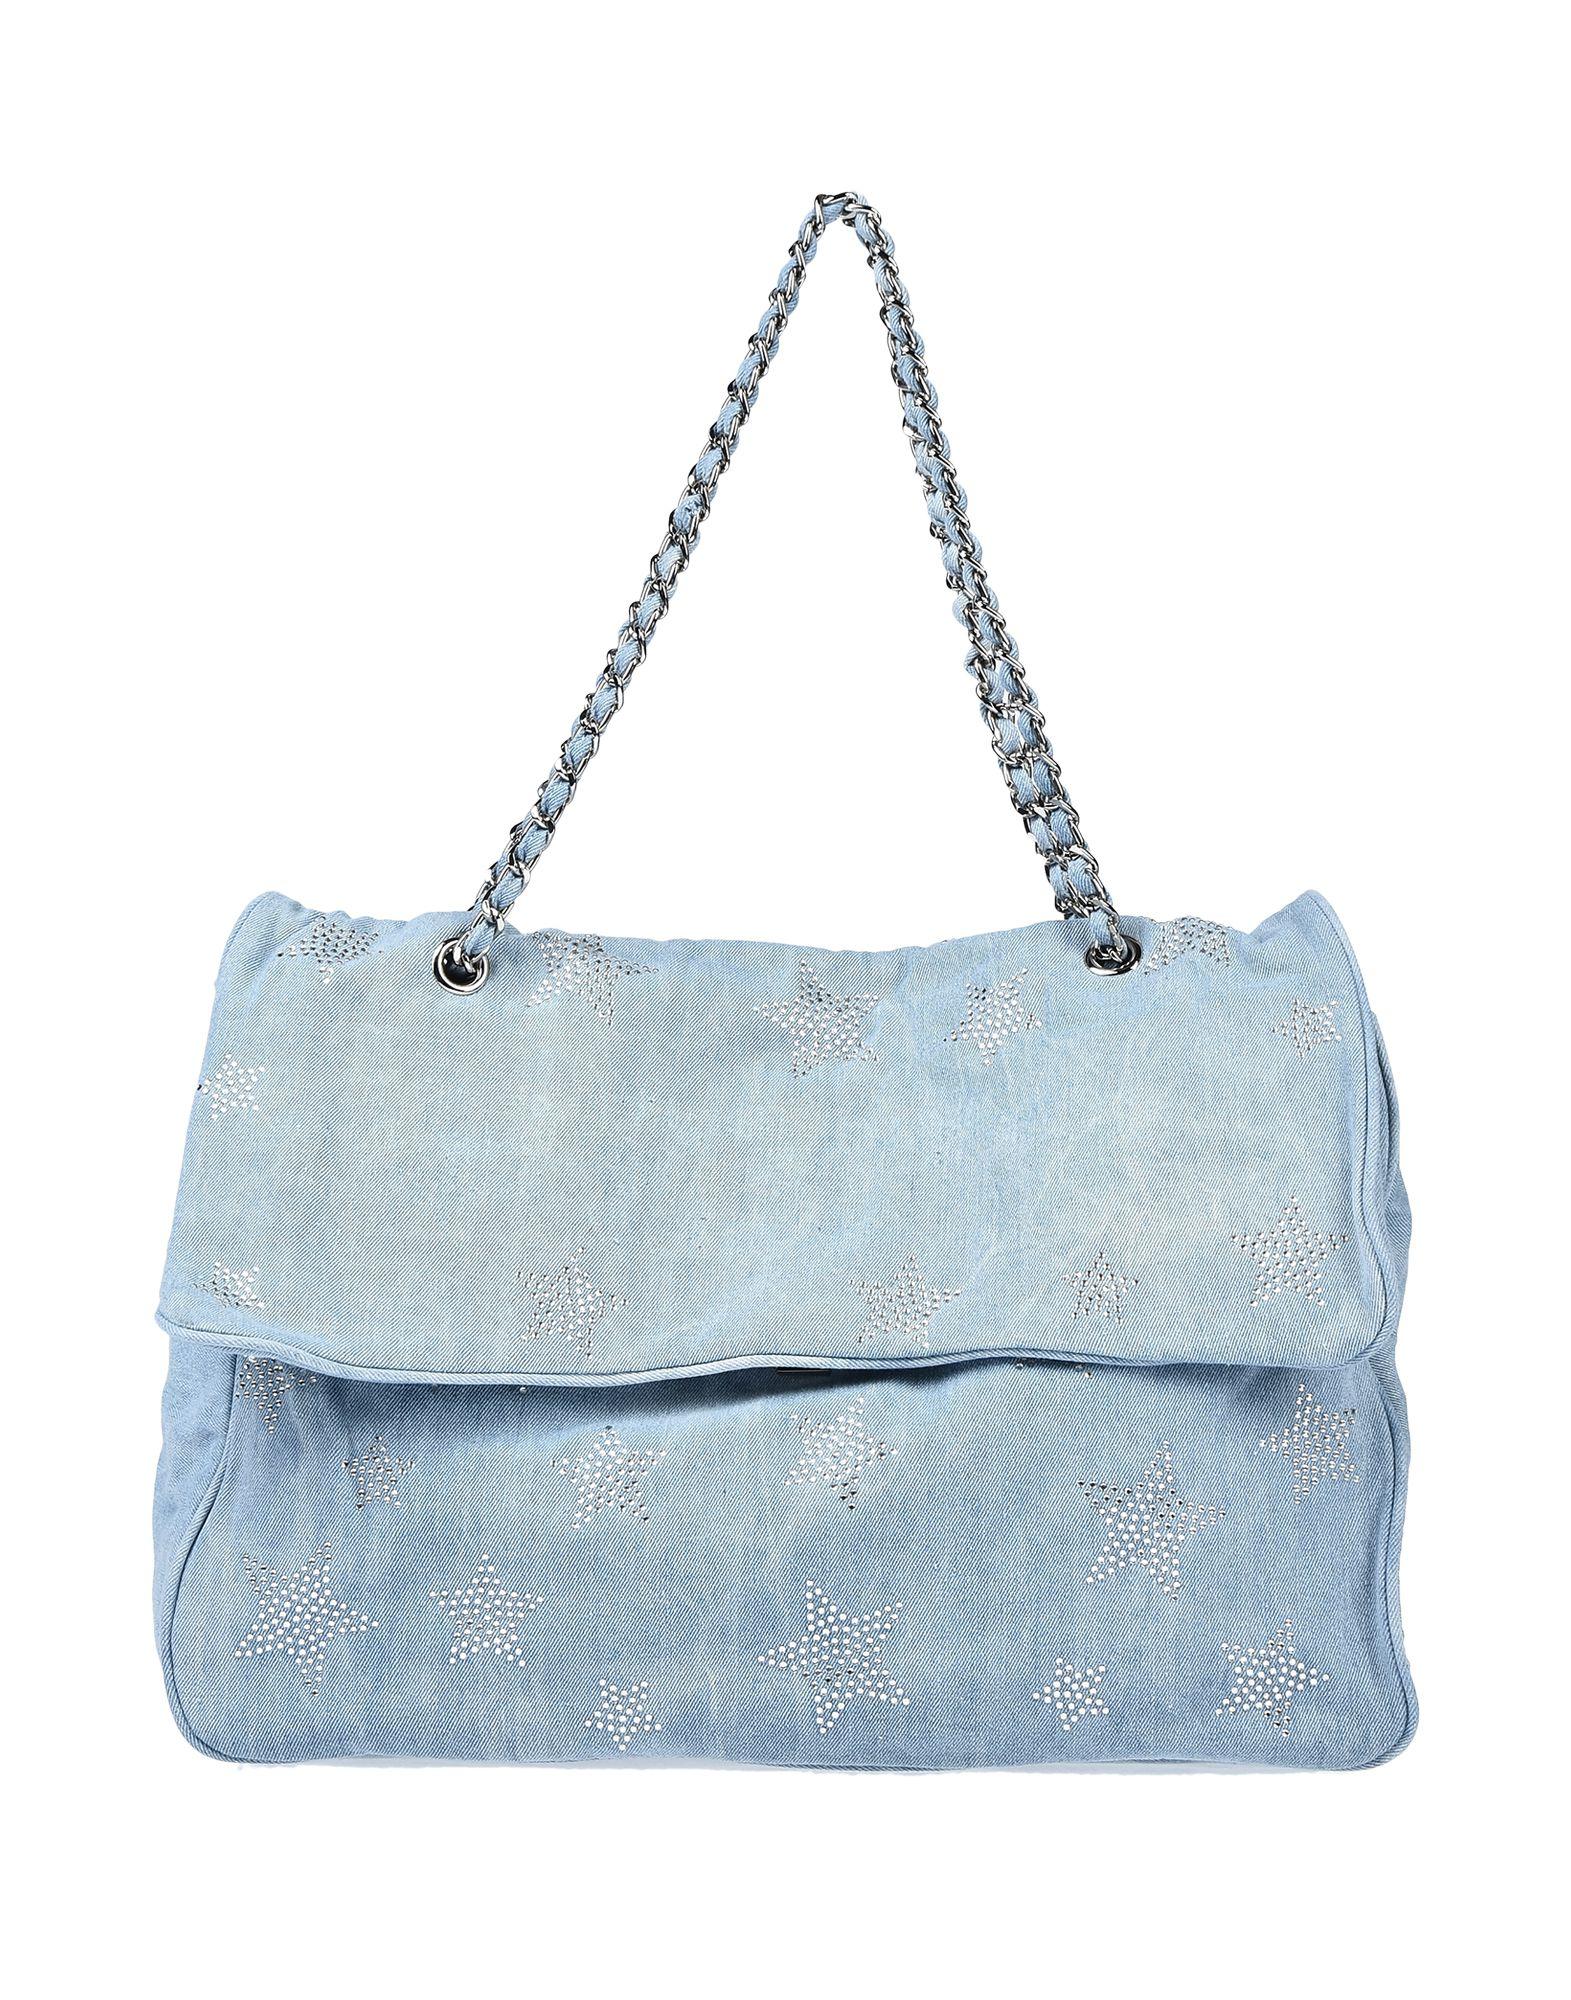 Фото - MIA BAG Сумка на плечо cow leather tote bag brand 2018 bolsa feminina new women handbag 100% genuine leather alligator shoulder bag free shipping